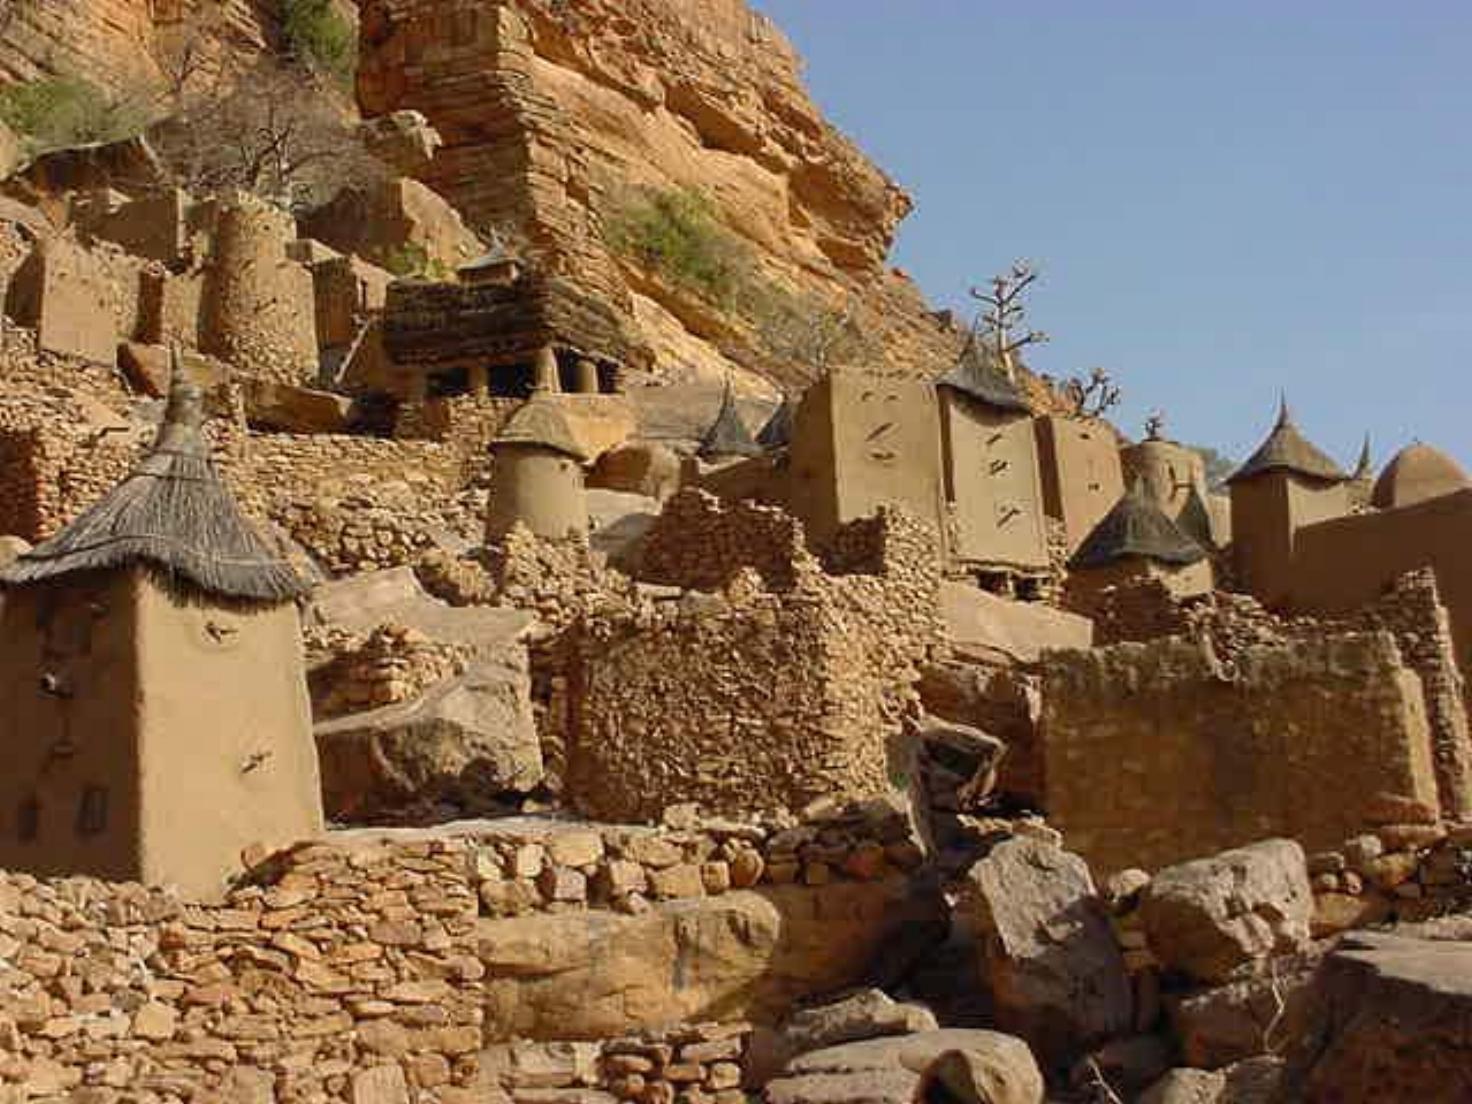 The village is built long the Bandiagara